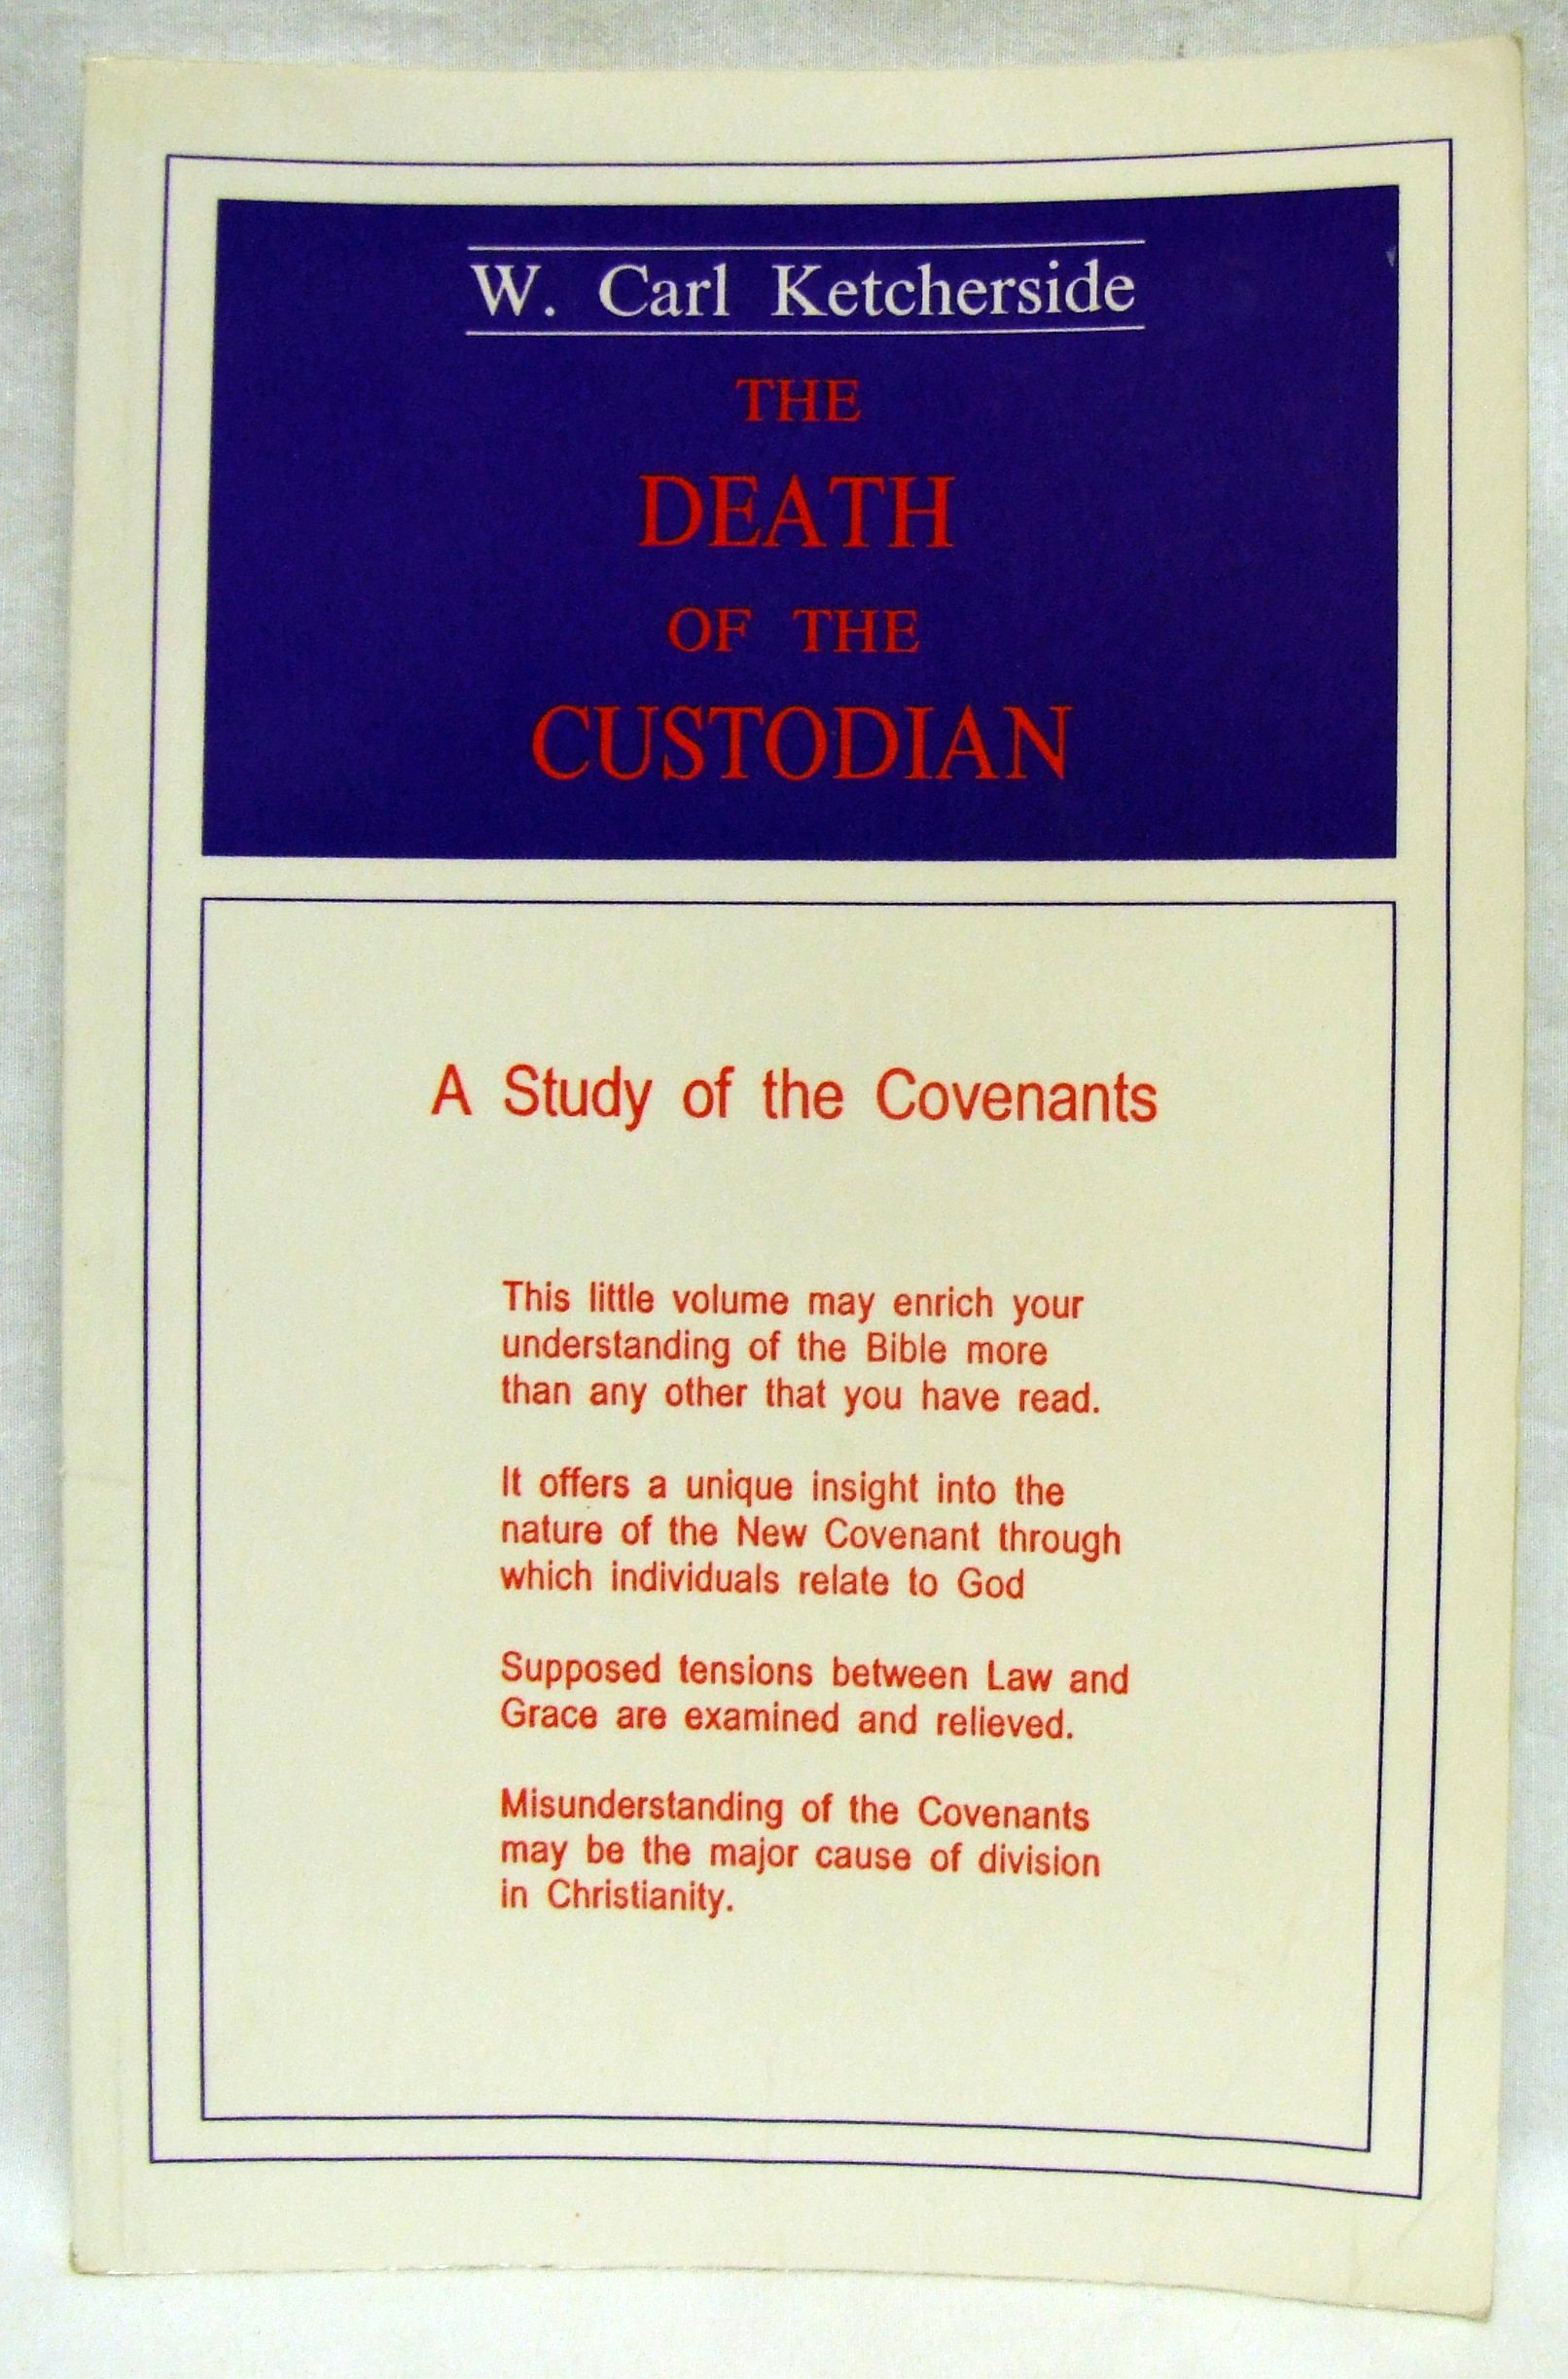 The Death of the Custodian